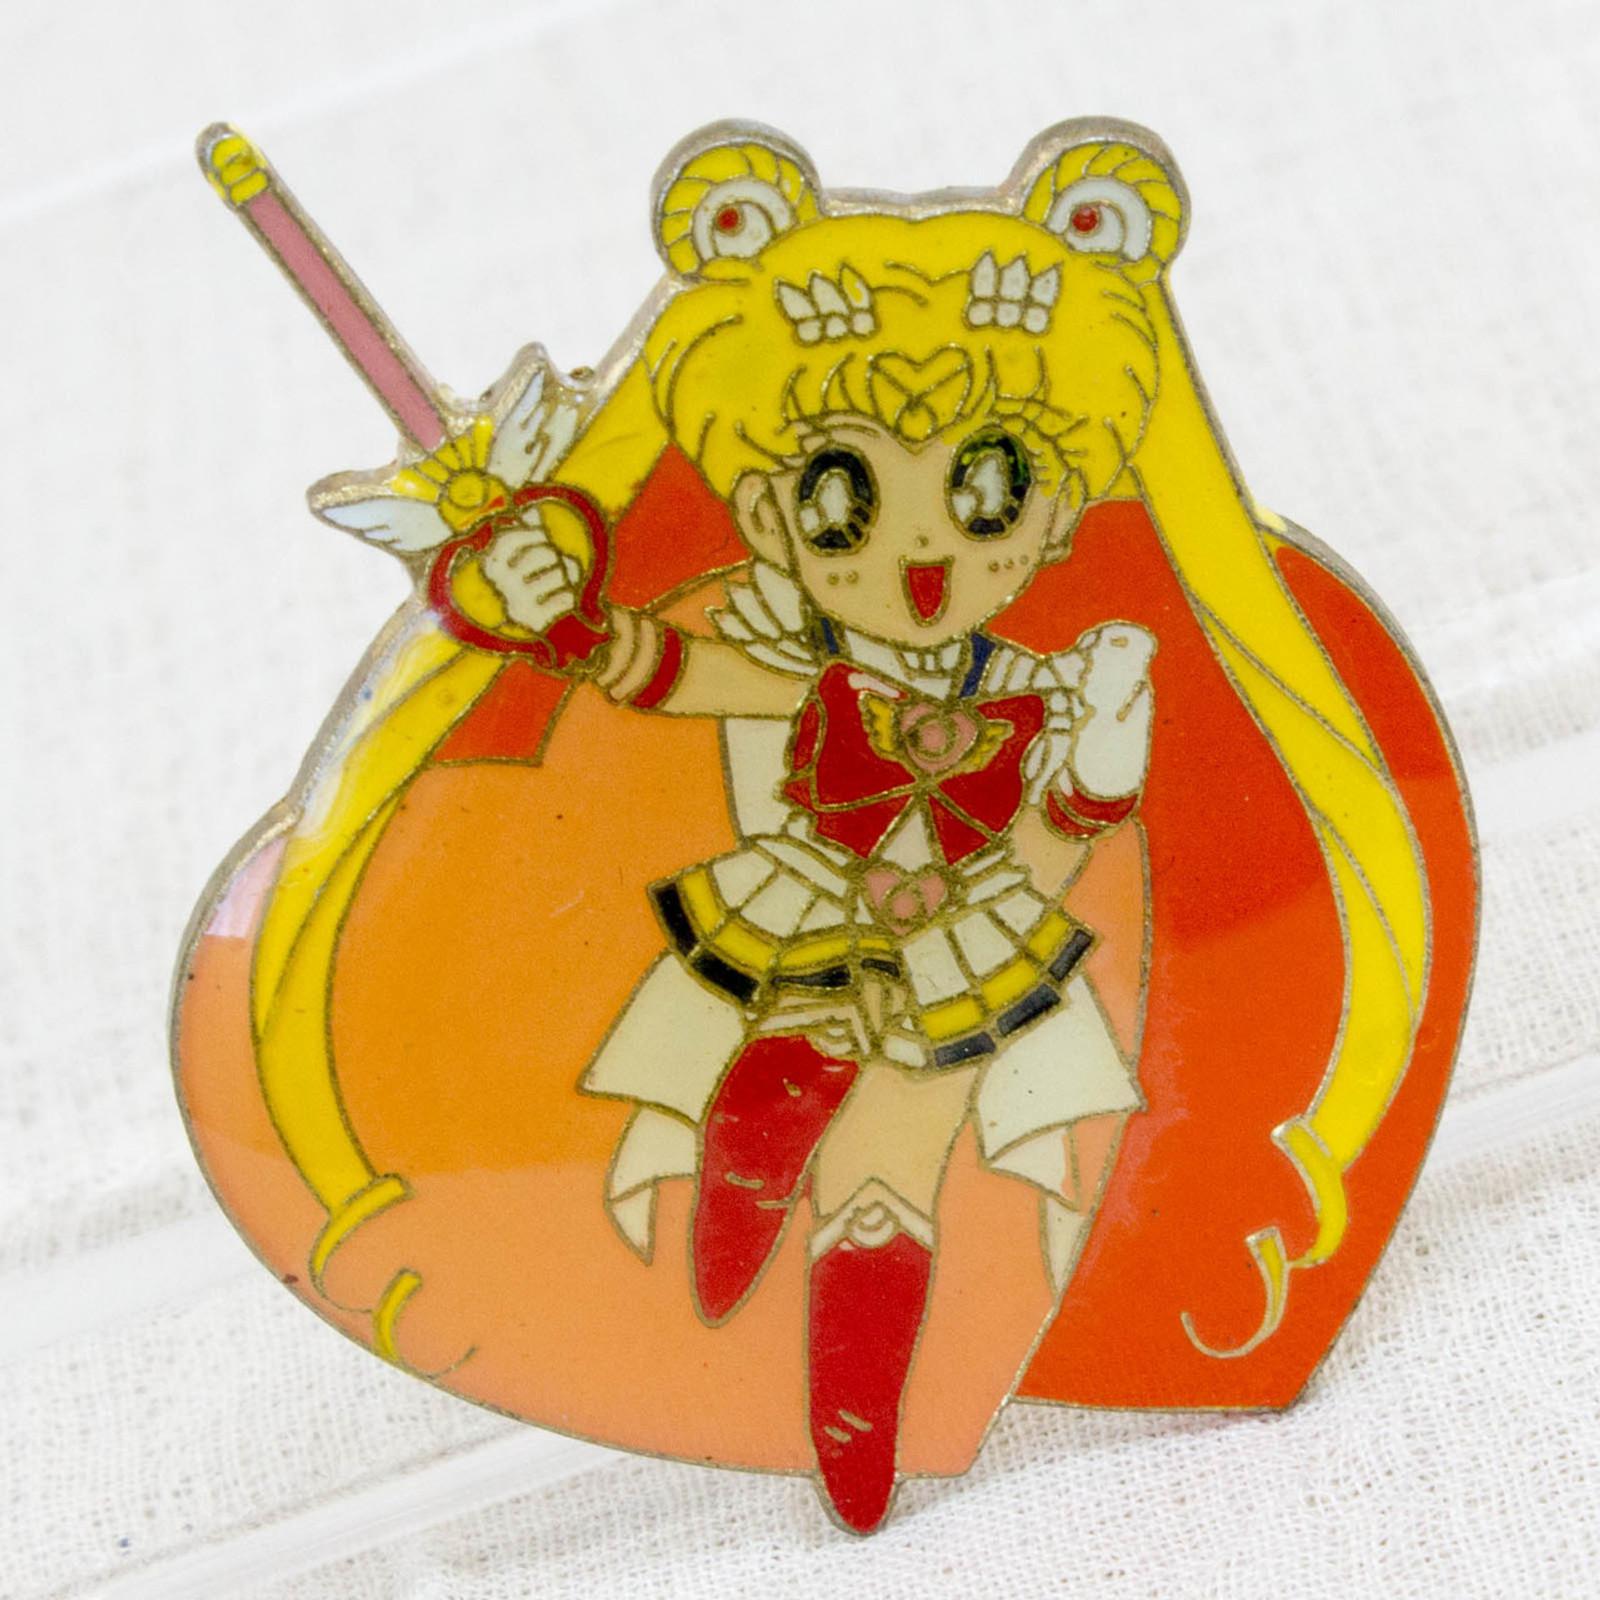 Pretty Soldier Sailor Moon Usagi Tsukino Metal Pins Badge JAPAN ANIME MANGA 4